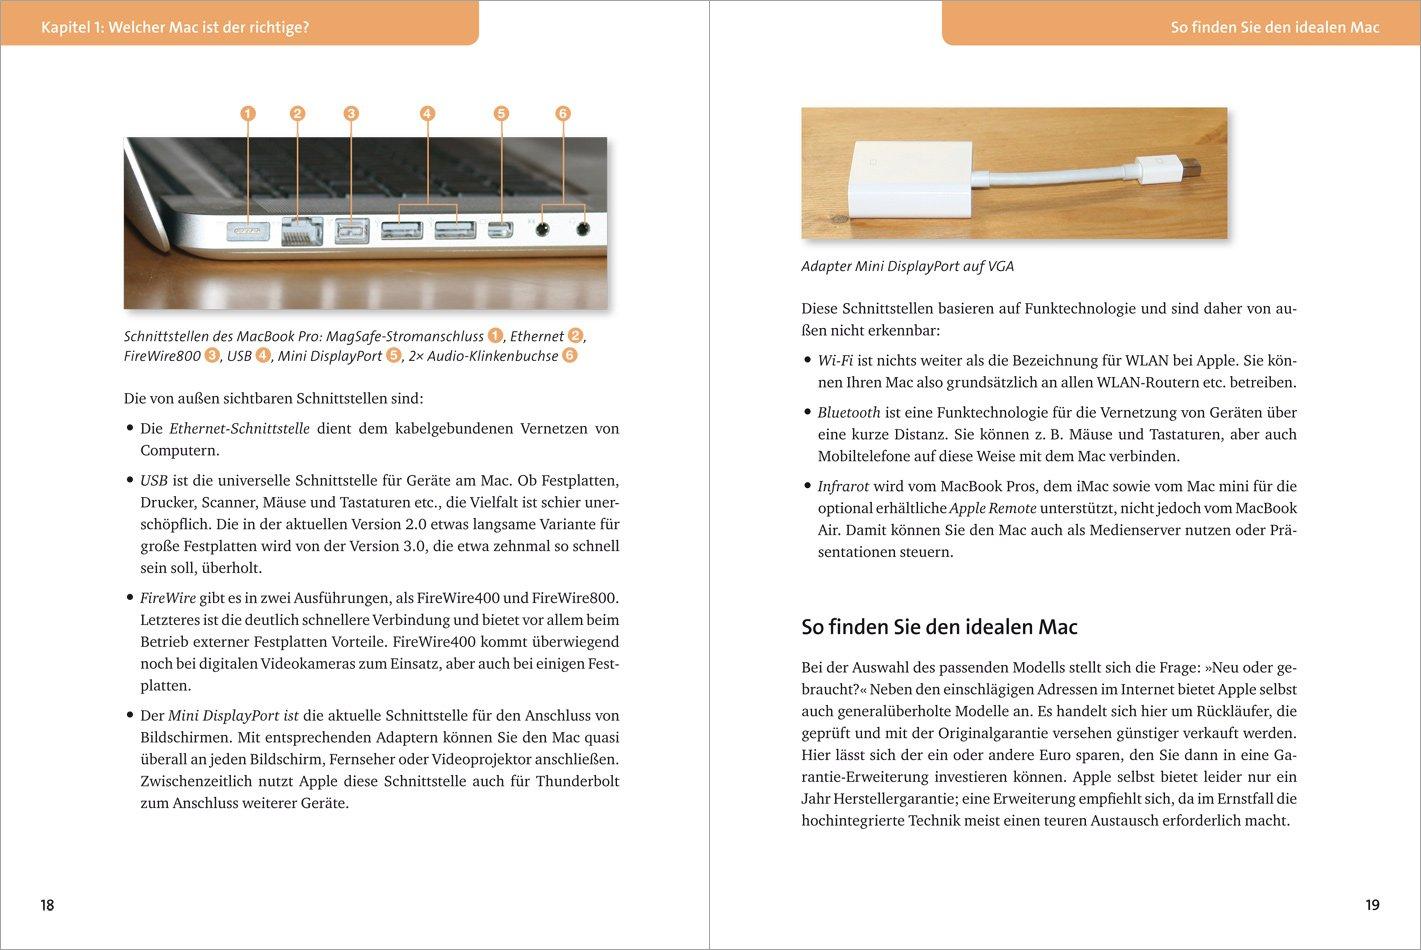 Atemberaubend Macbook Pro Firewire Anschluss Ideen - Der Schaltplan ...